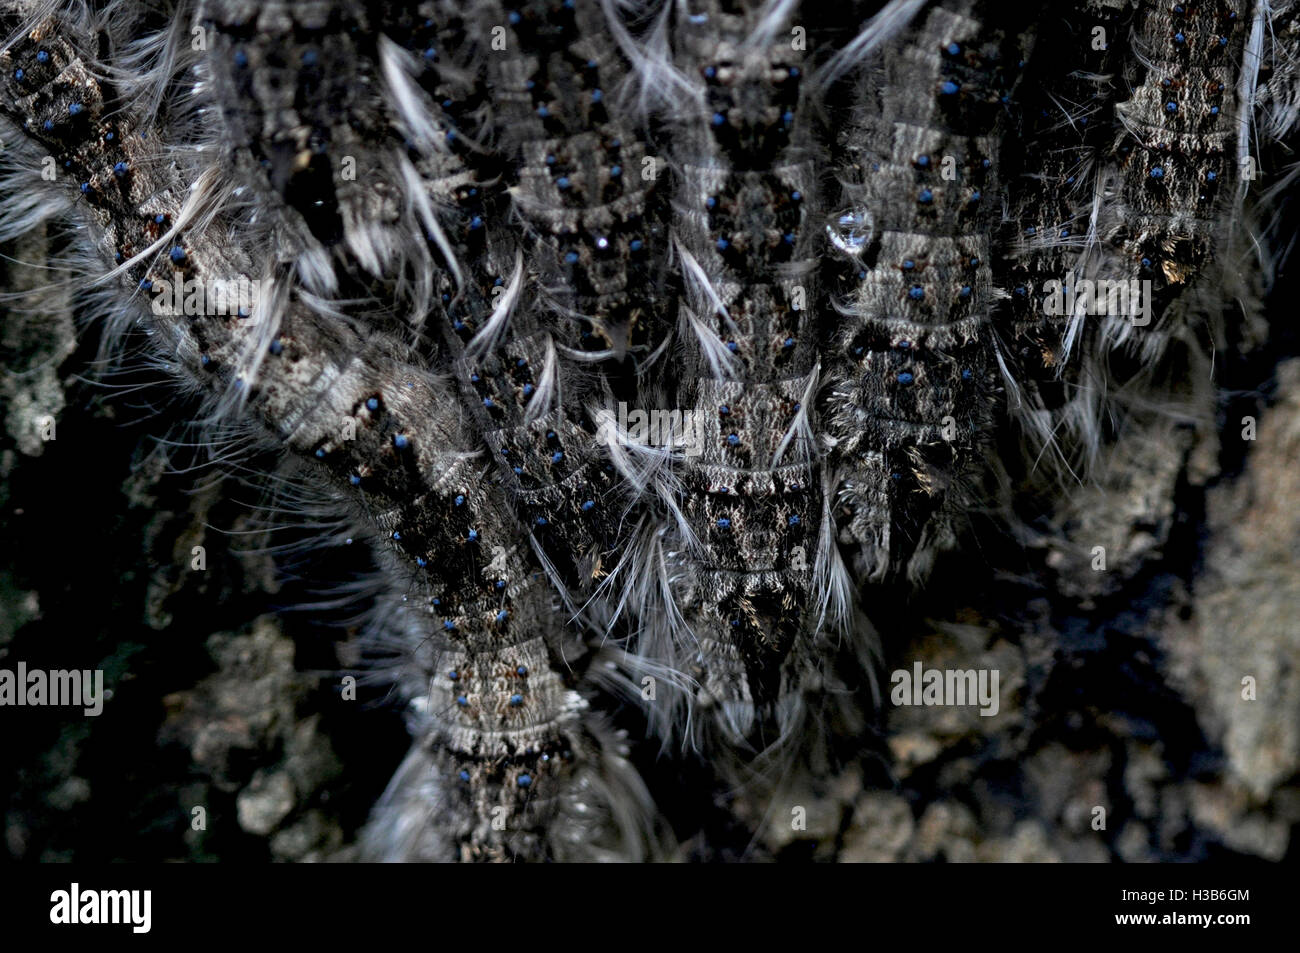 Noida, Uttar Pradesh, India- August 21, 2016: A group of hairy Caterpillars on a tree in a garden at Noida, Uttar - Stock Image